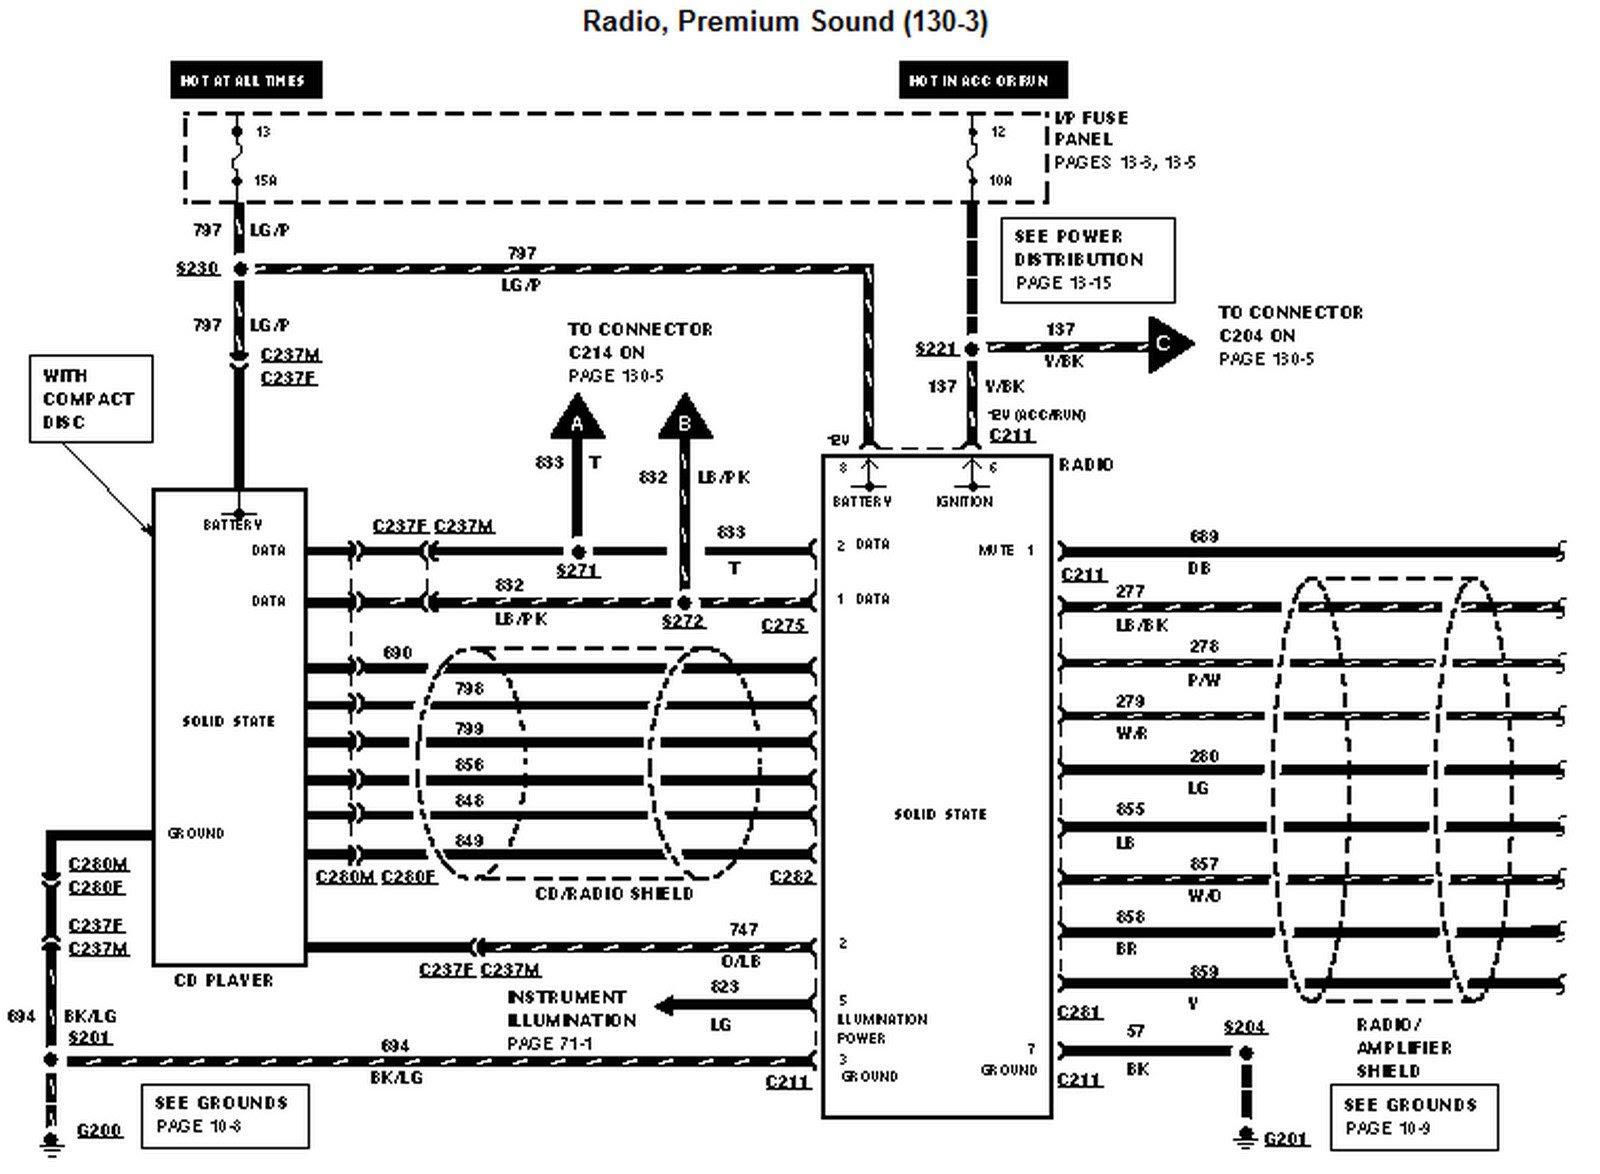 1995 Ford Windstar Radio Wiring Diagram 98 Windstar Fuse Box Diagram Begeboy Wiring Diagram Source